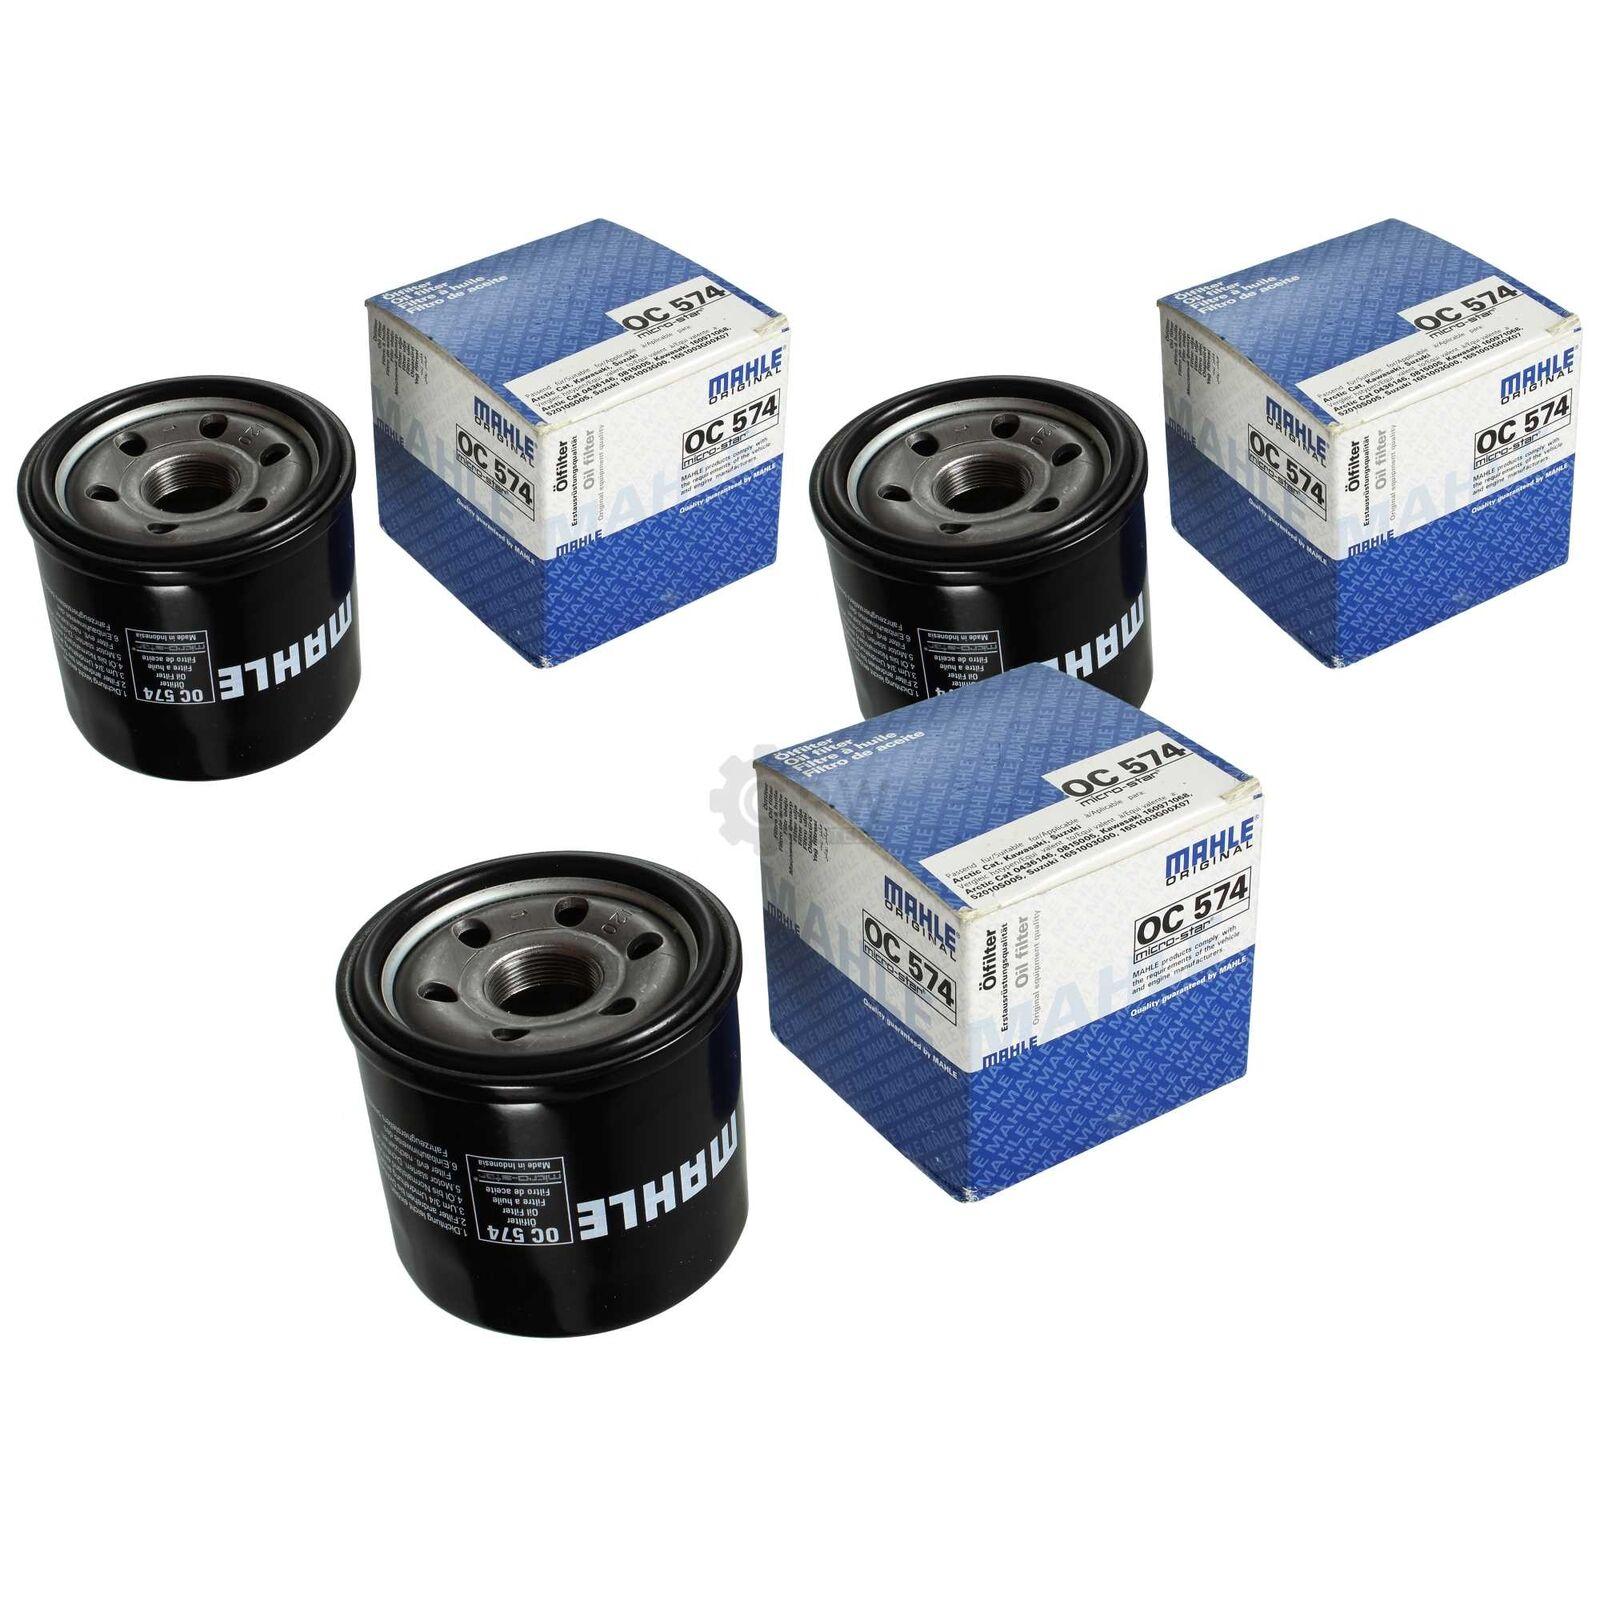 Oil Filter fits MAZDA Mann B6YL14302 B35914302 B6YI14302 B6Y014300 B6Y114302 New